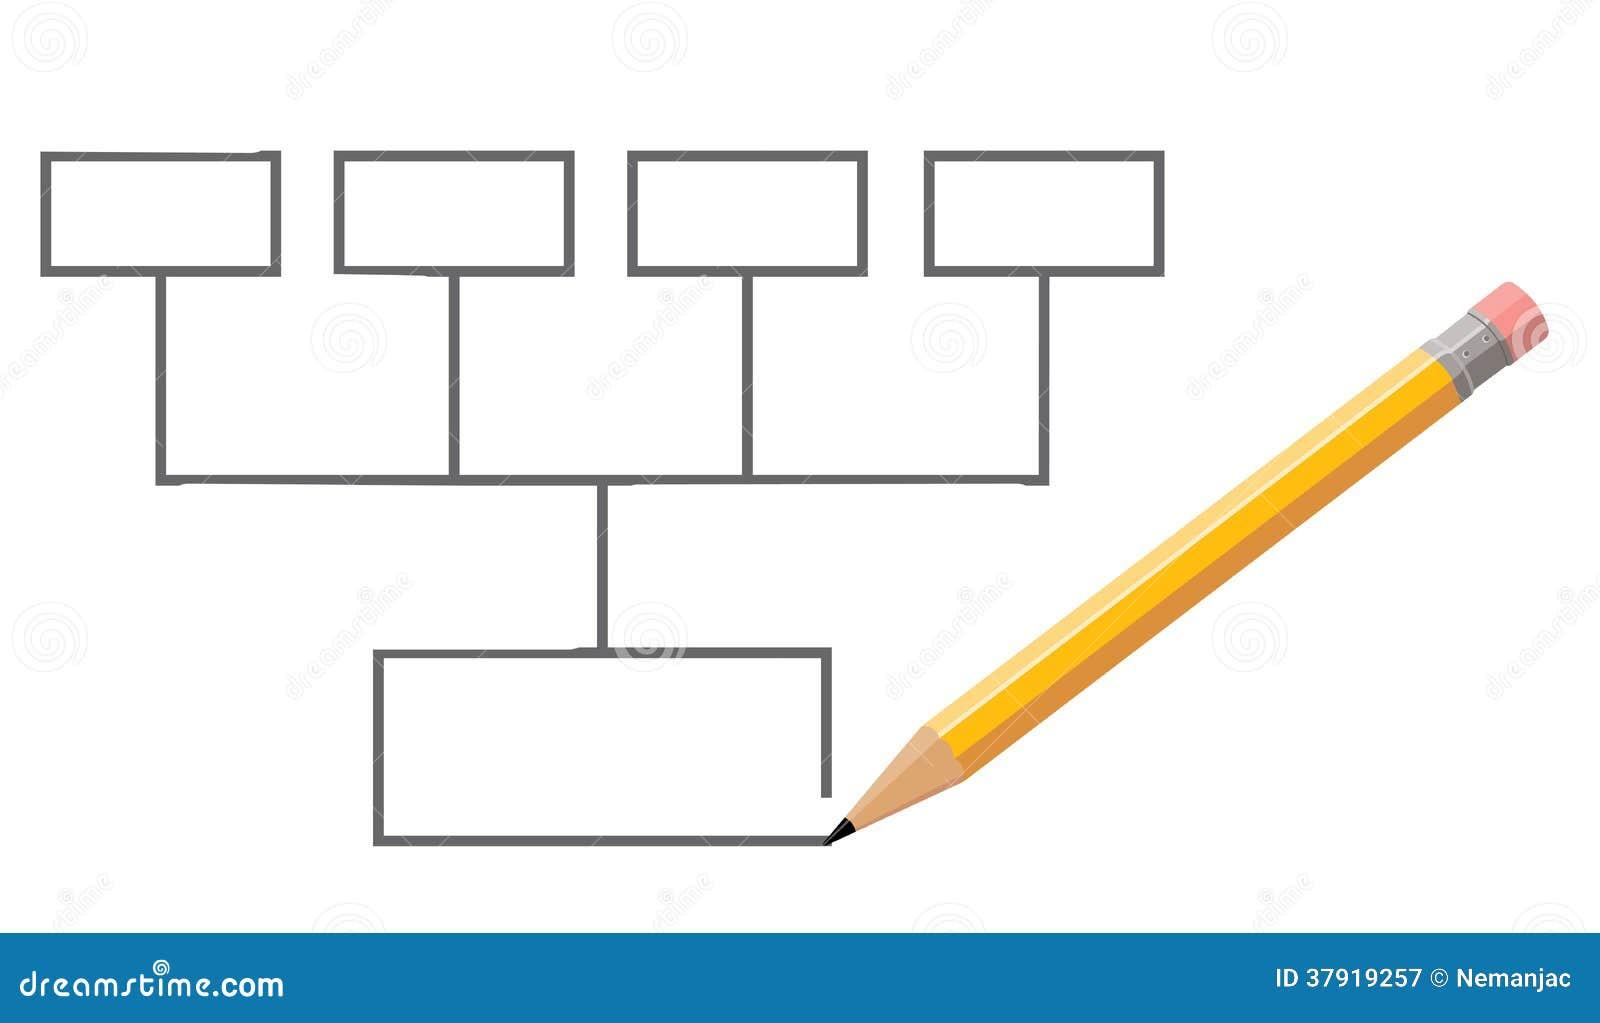 Stylo  U00e9crivant Le Diagramme Vide Illustration Stock